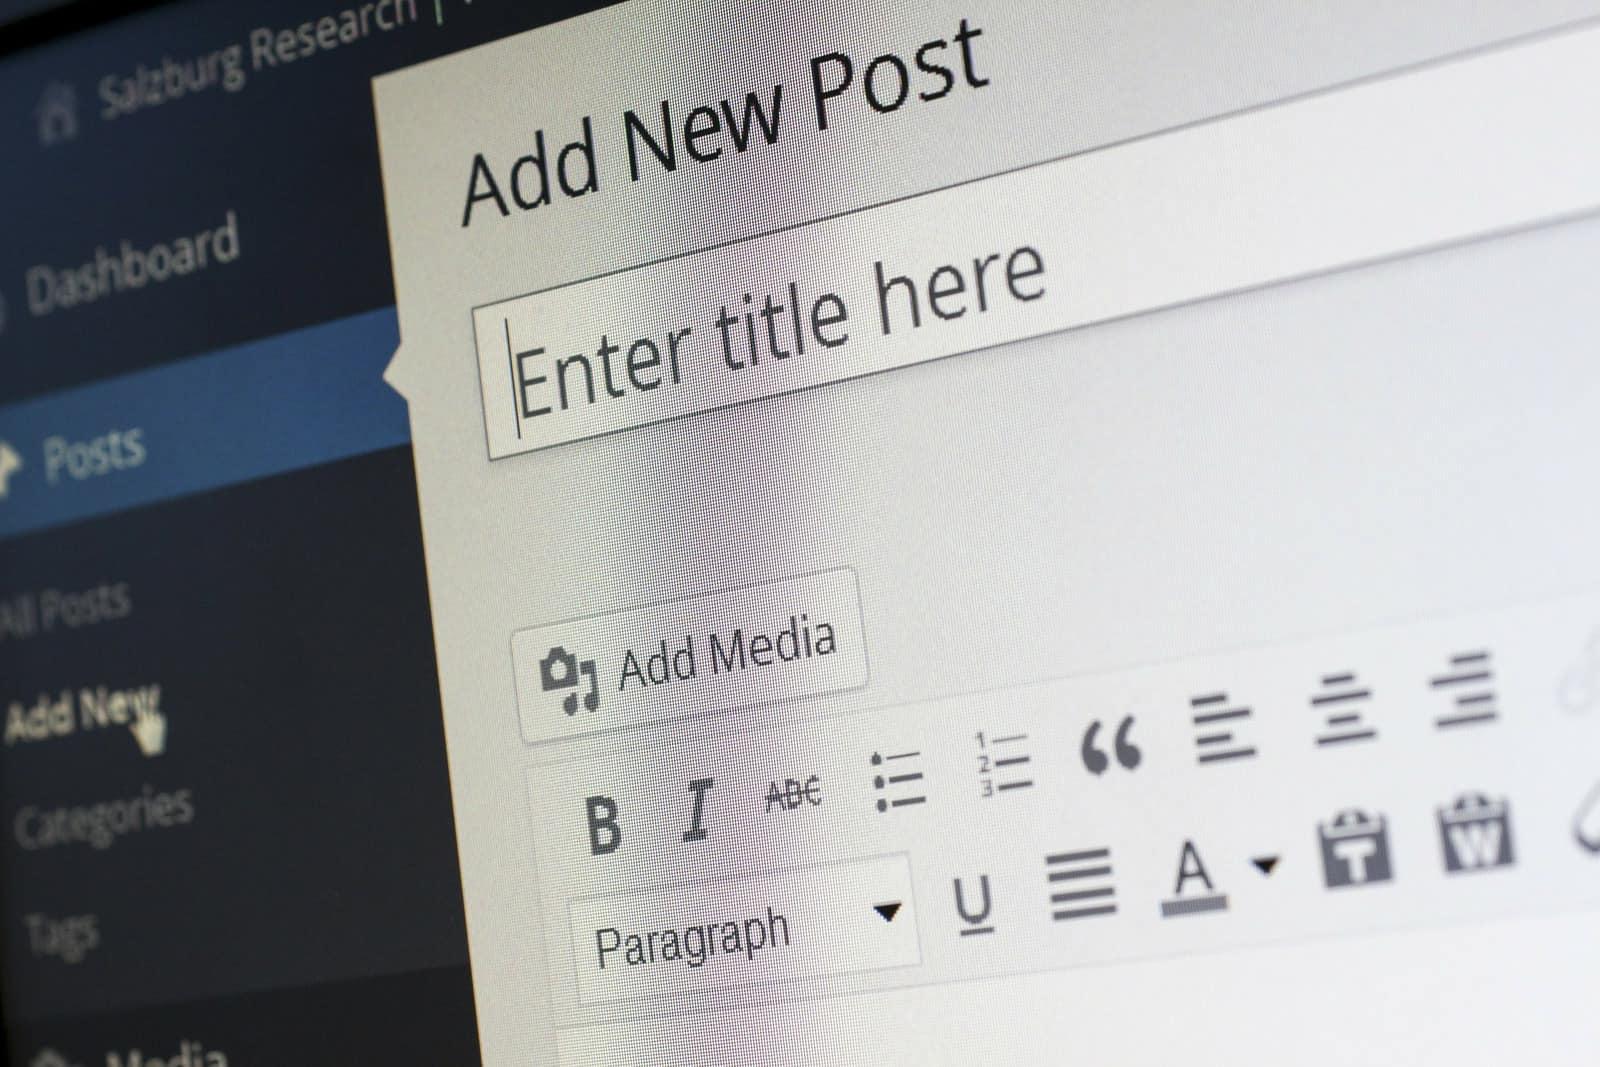 Add new post option in WordPress